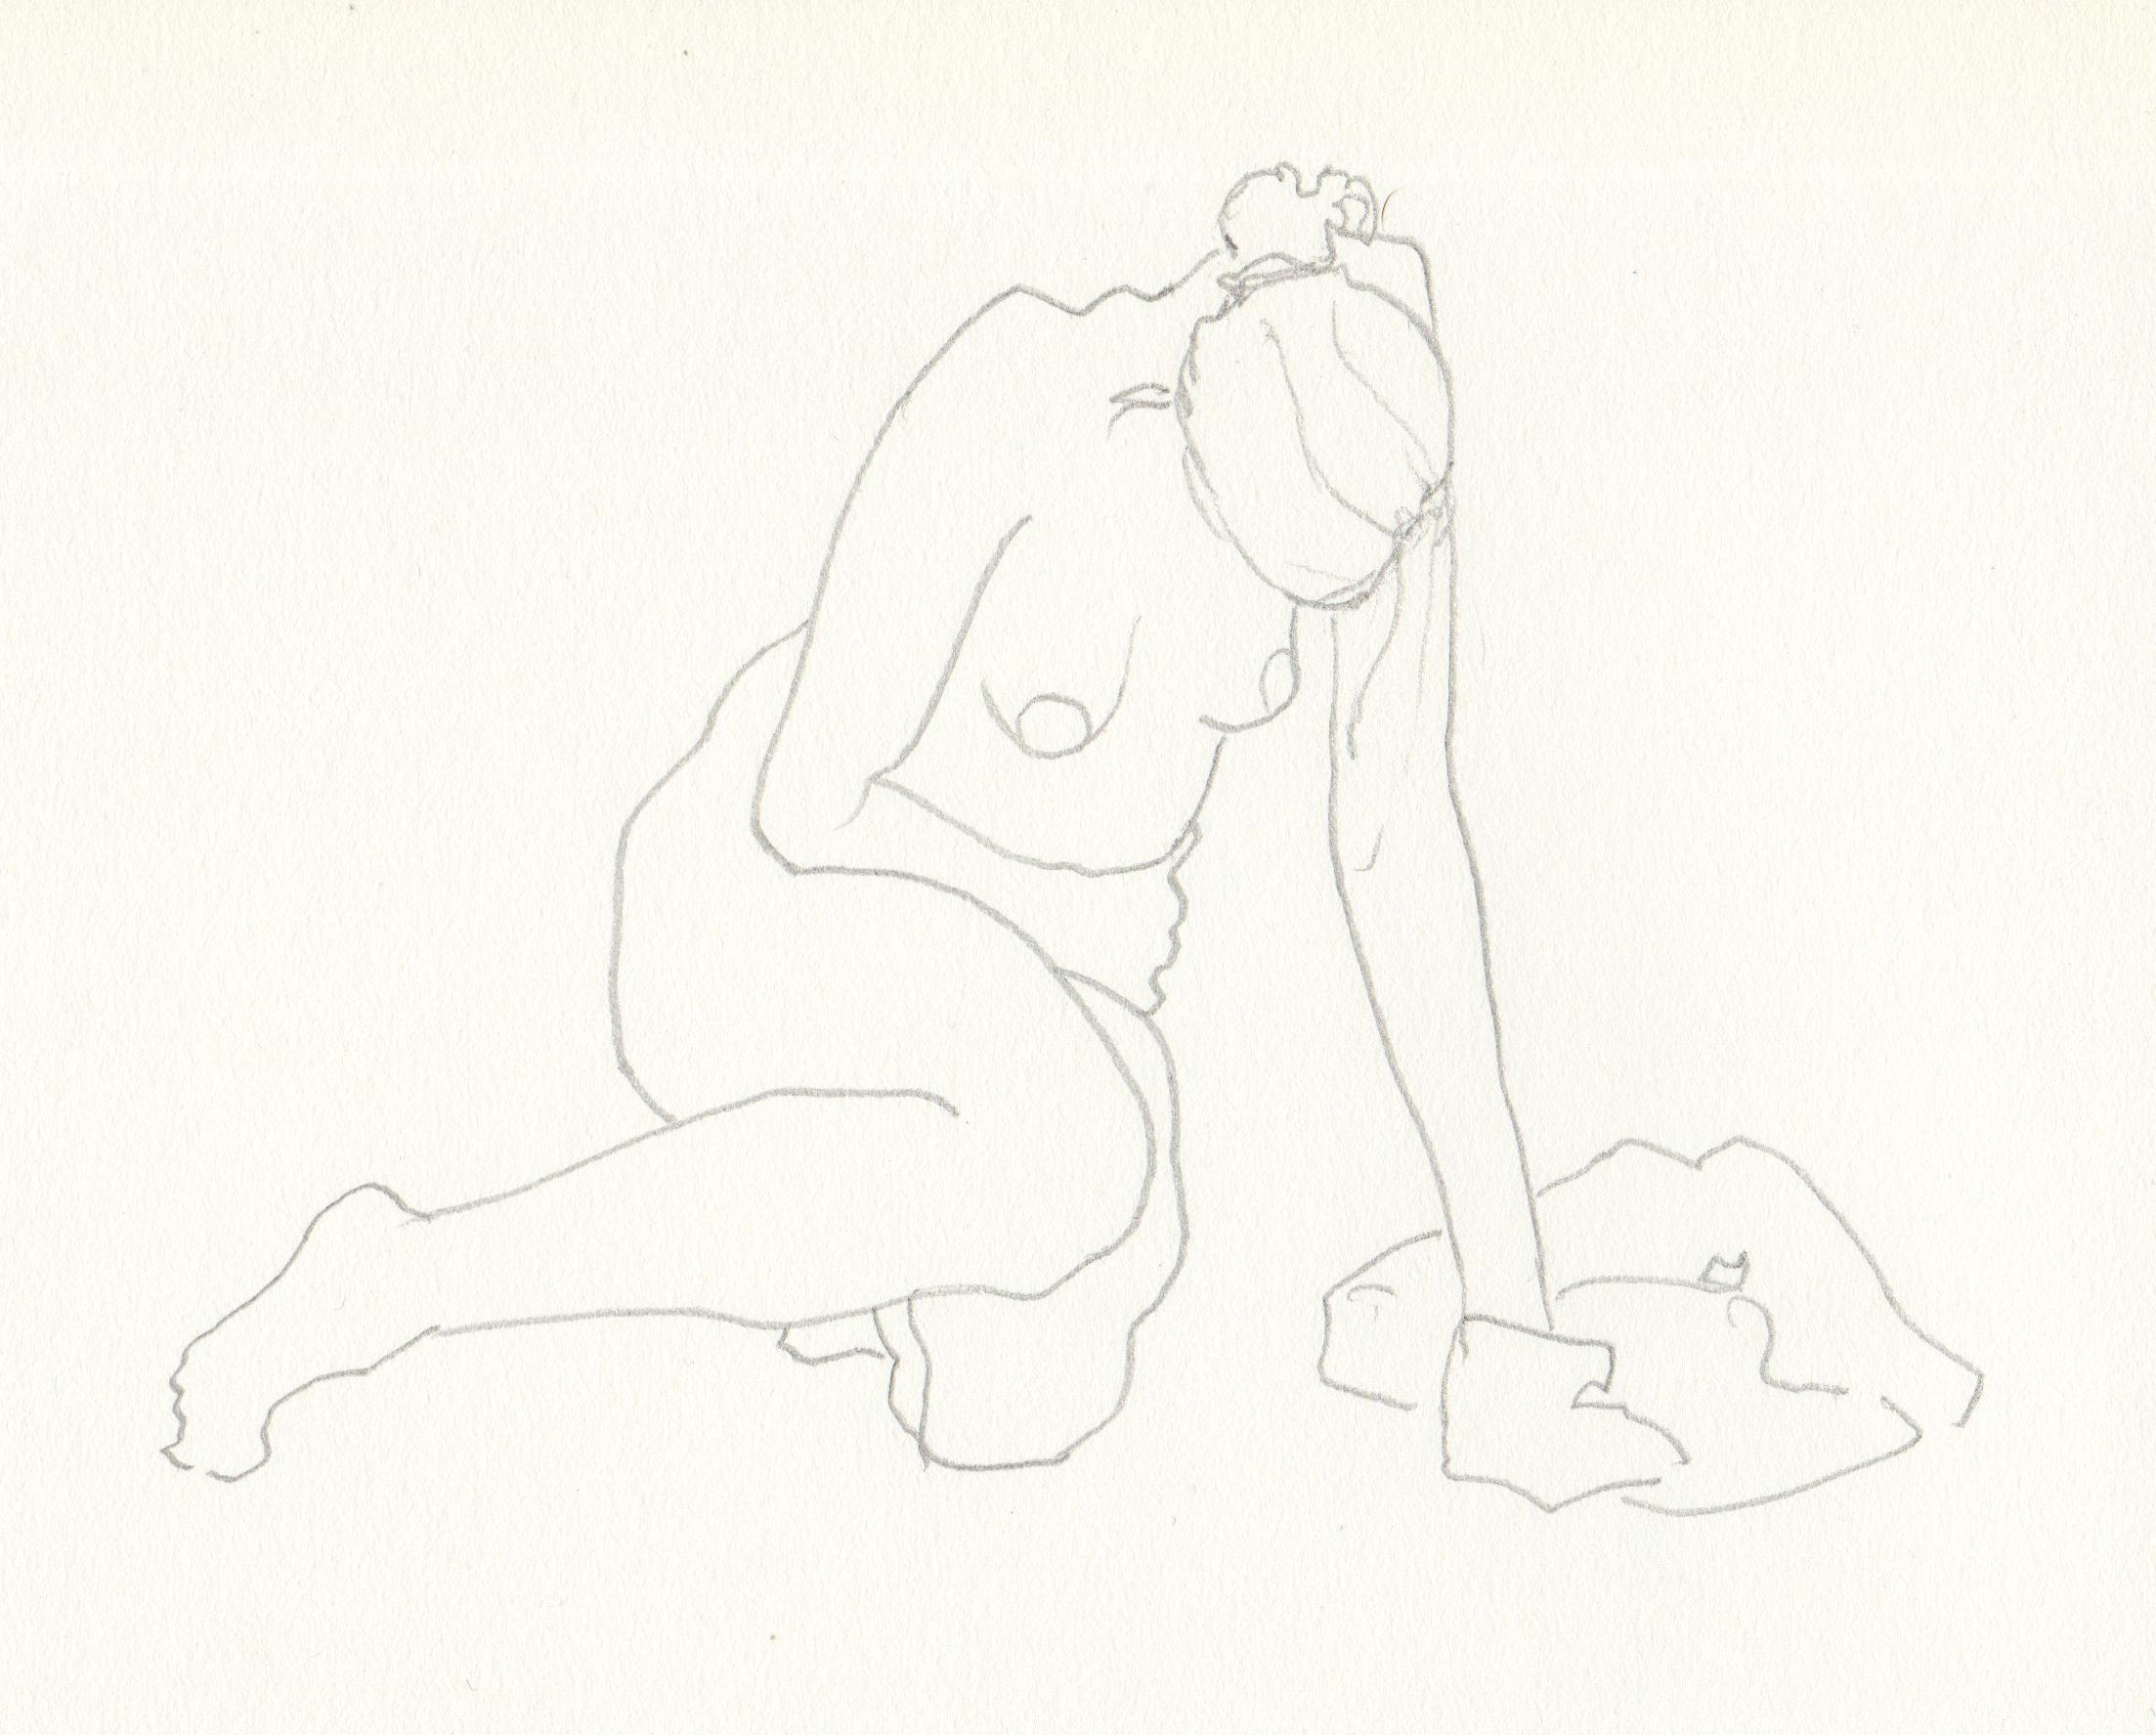 2012_Sketch_F-Beudin_056